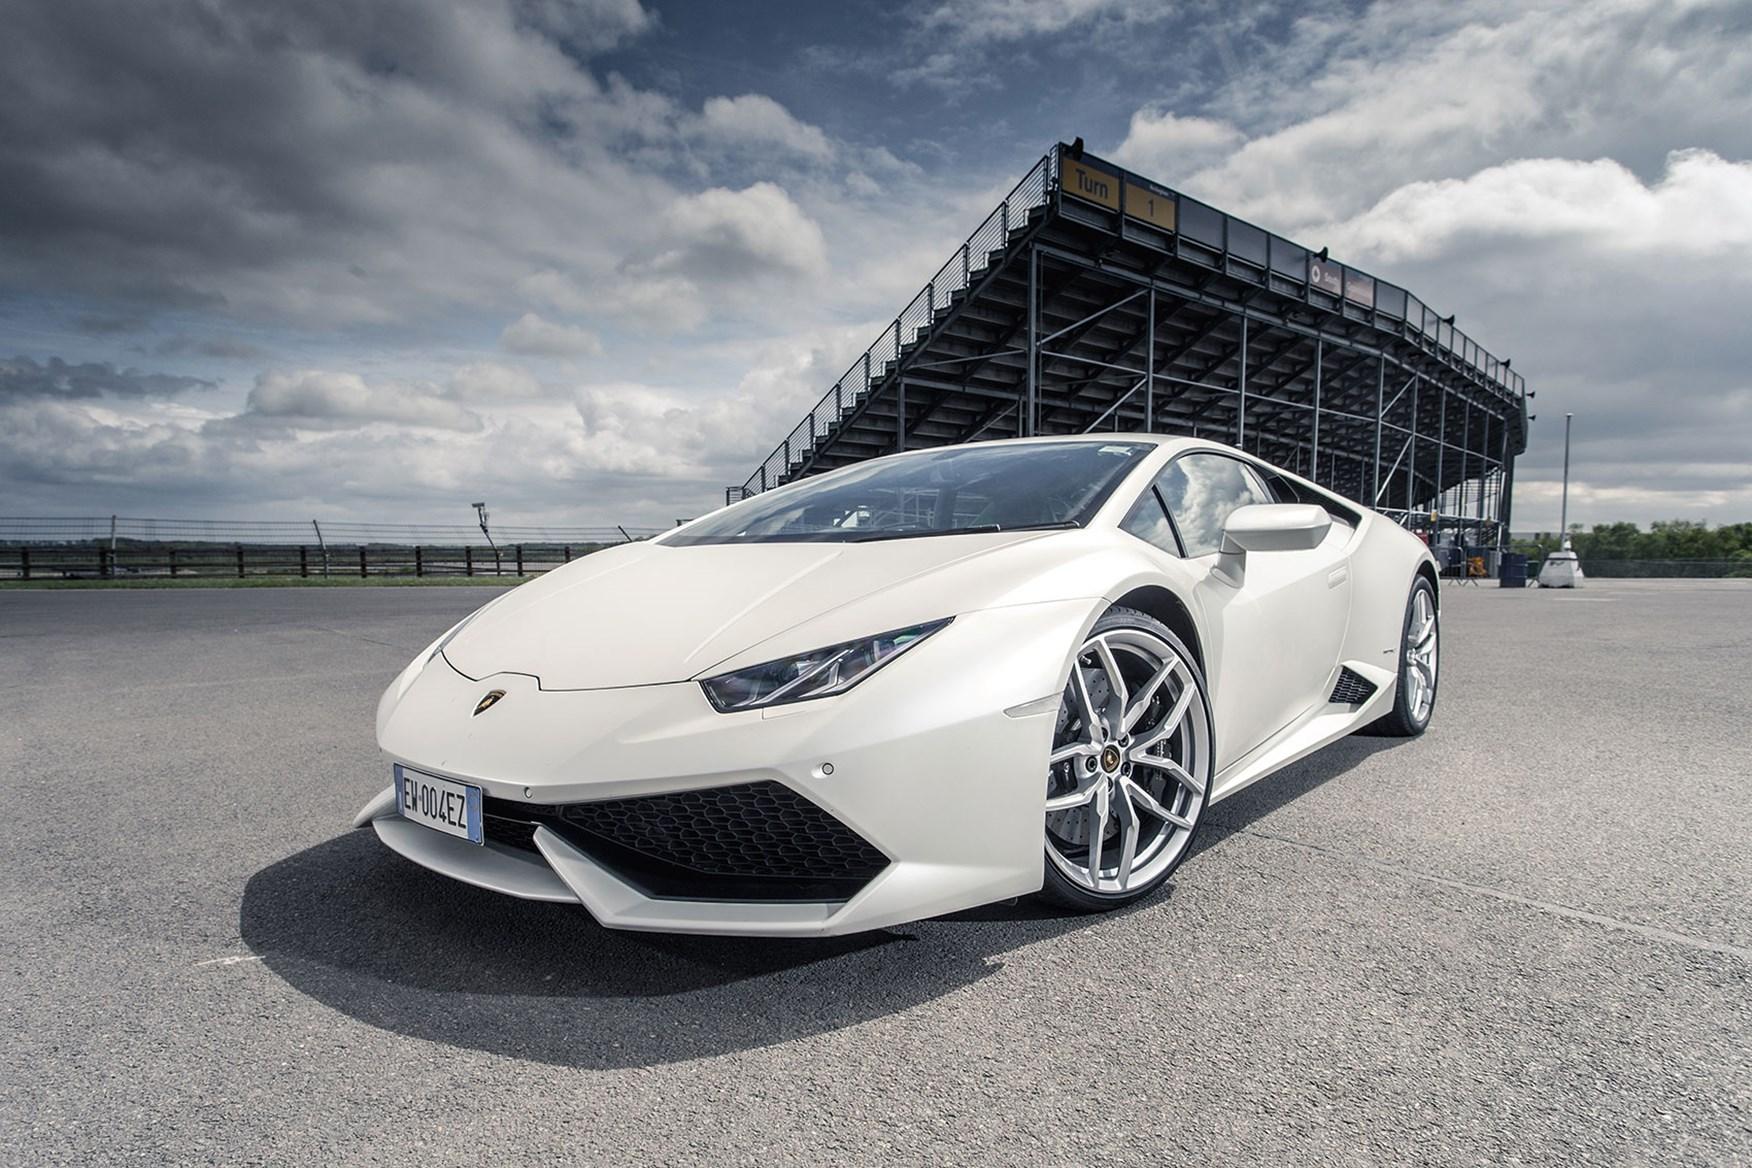 Lamborghini Huracan Lp610 4 Long Term Test Review 2015 By Car Magazine